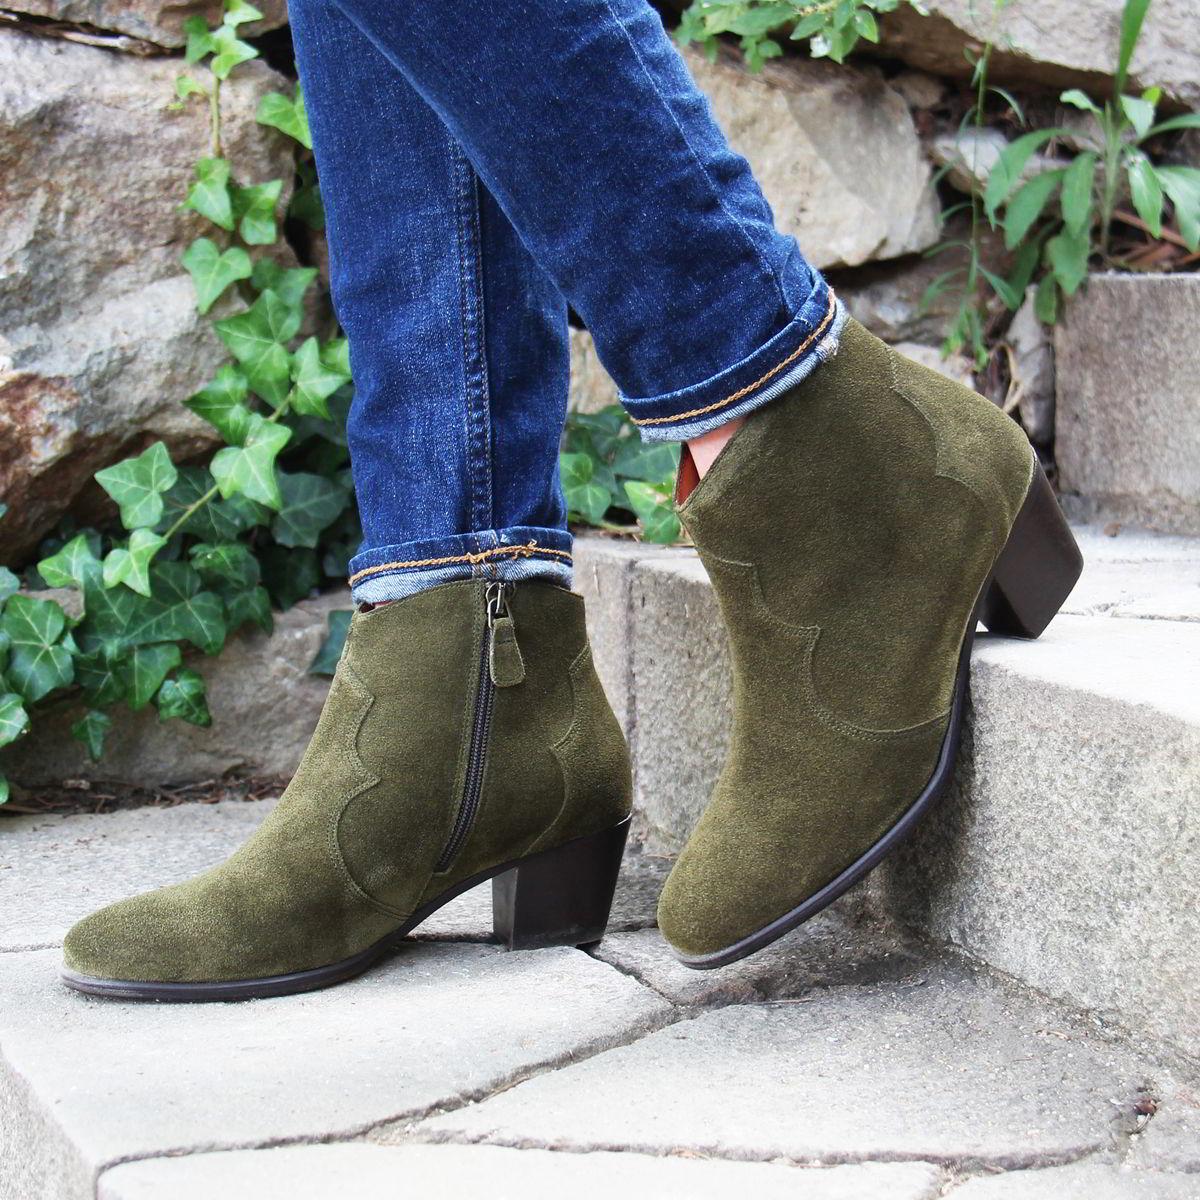 Jules and Jenn - bottines cowboy kaki